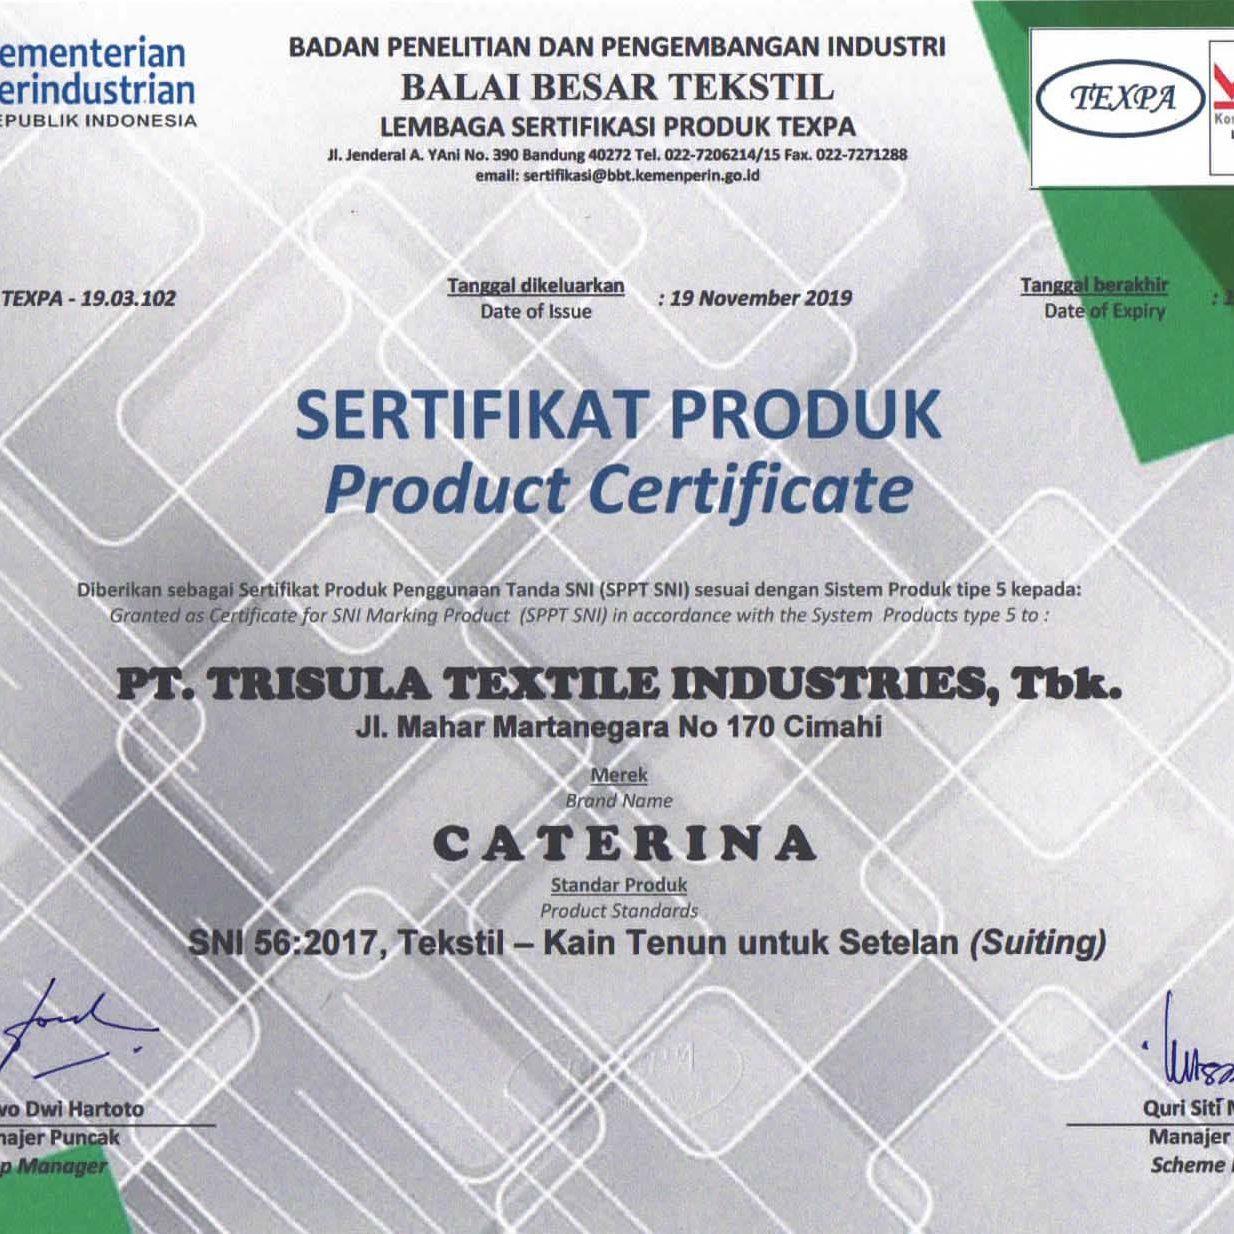 Sertifikat 56 - 2017 Produk Caterina 2022